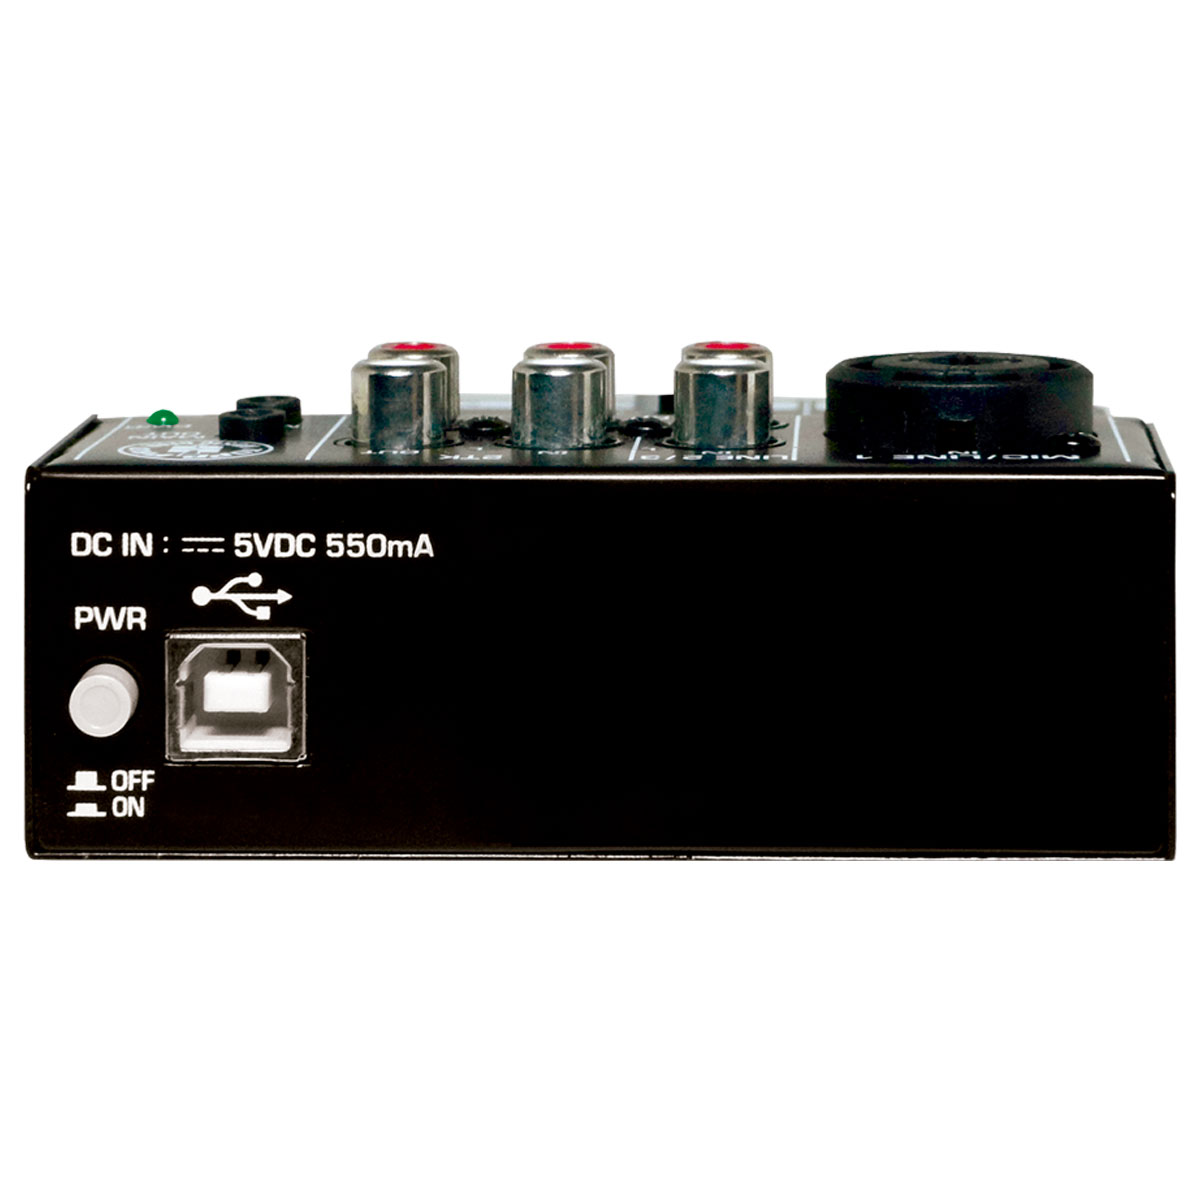 MX3BT - Mesa de Som / Micro Mixer 3 Canais c/ Bluetooth e USB MX 3 BT - CSR